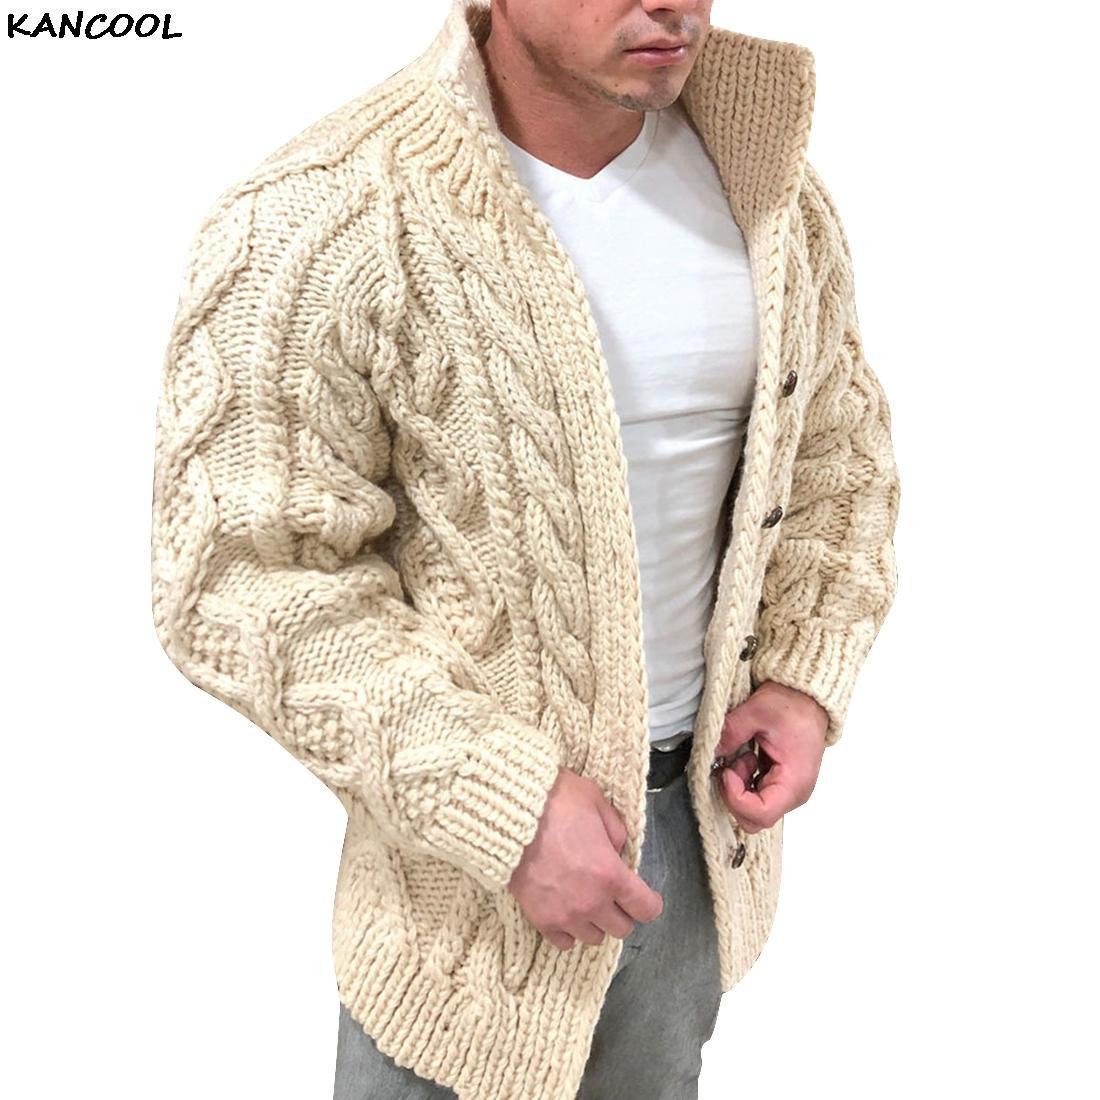 KANCOOL 2020 para homens suéteres outono inverno quente malha camisola jaquetas casacos casacos masculinos roupas casuais